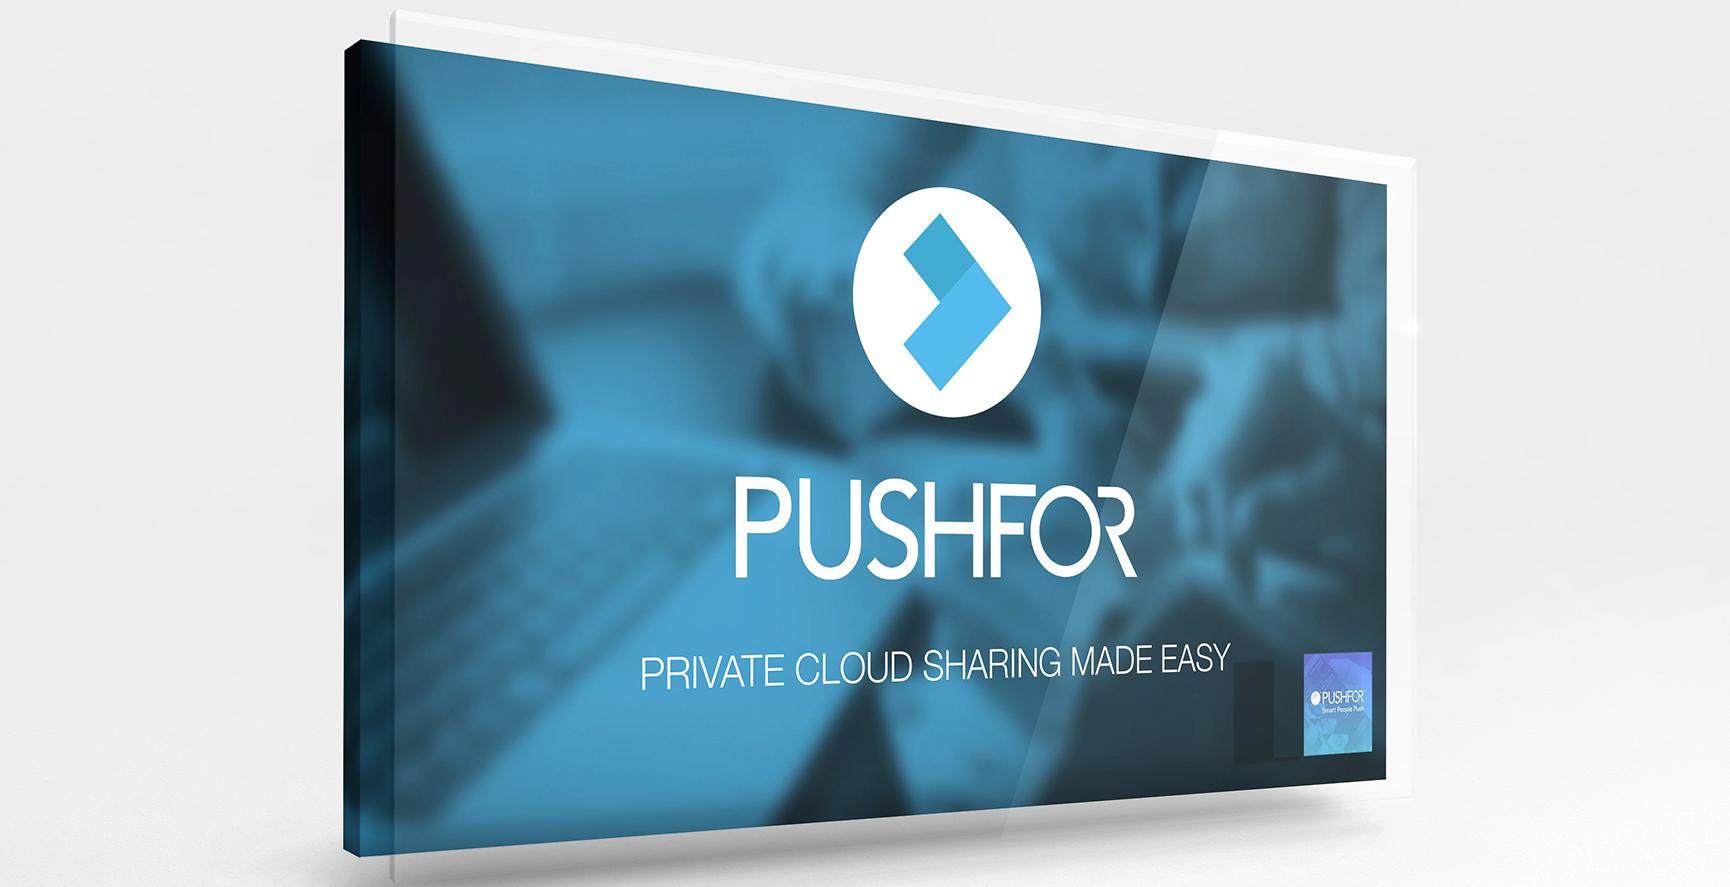 Pushfor_01